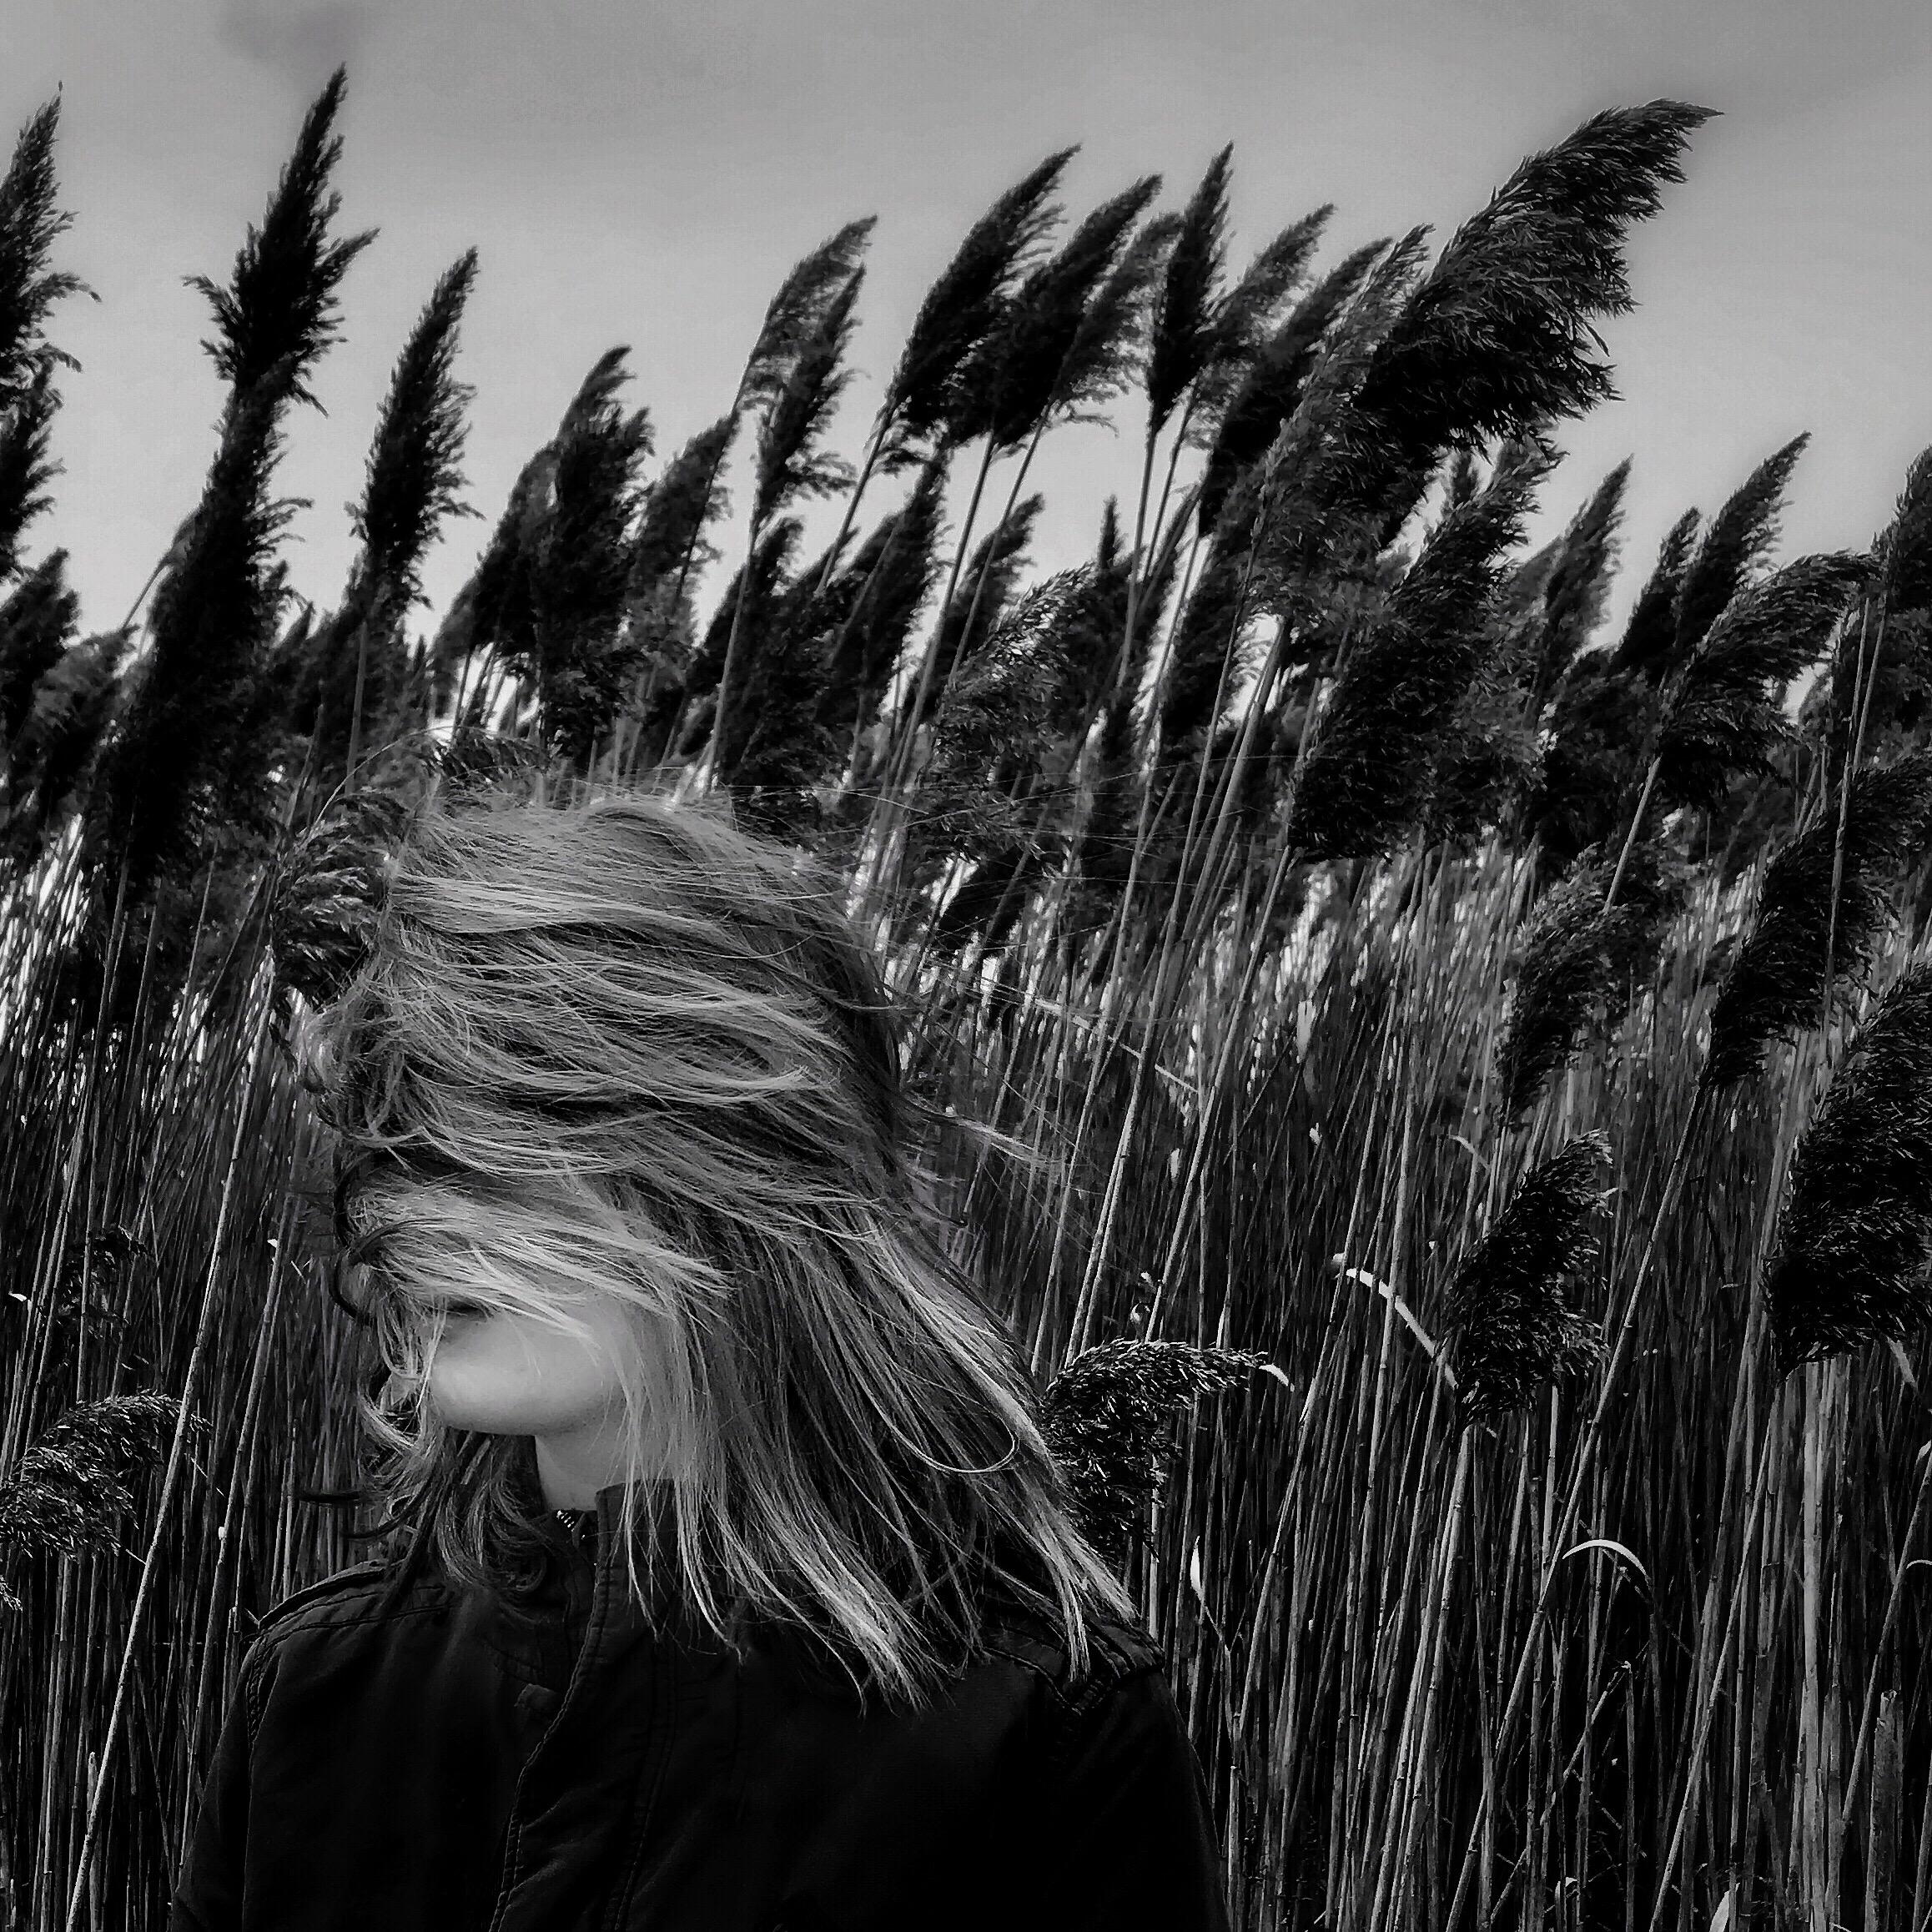 Will the Wind Remember by Nicola Pratt